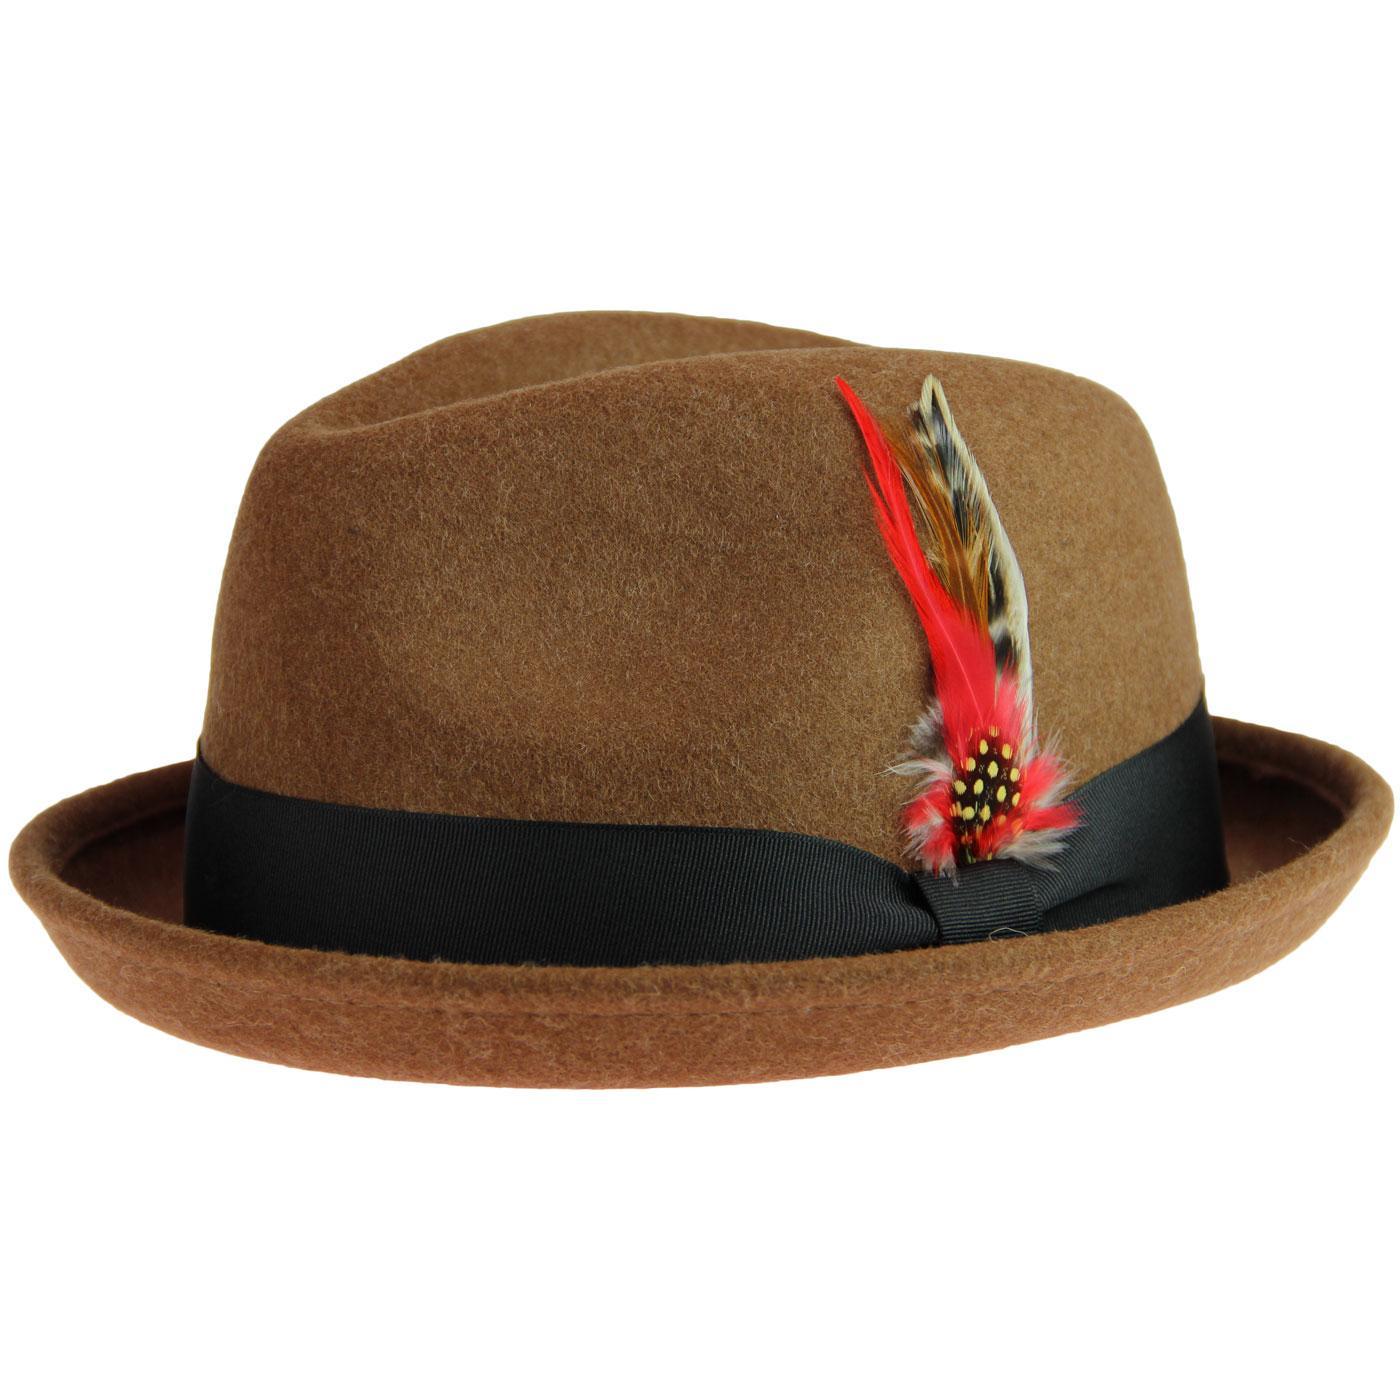 Brooklyn FAILSWORTH Mod Bluesman Trilby Hat PECAN